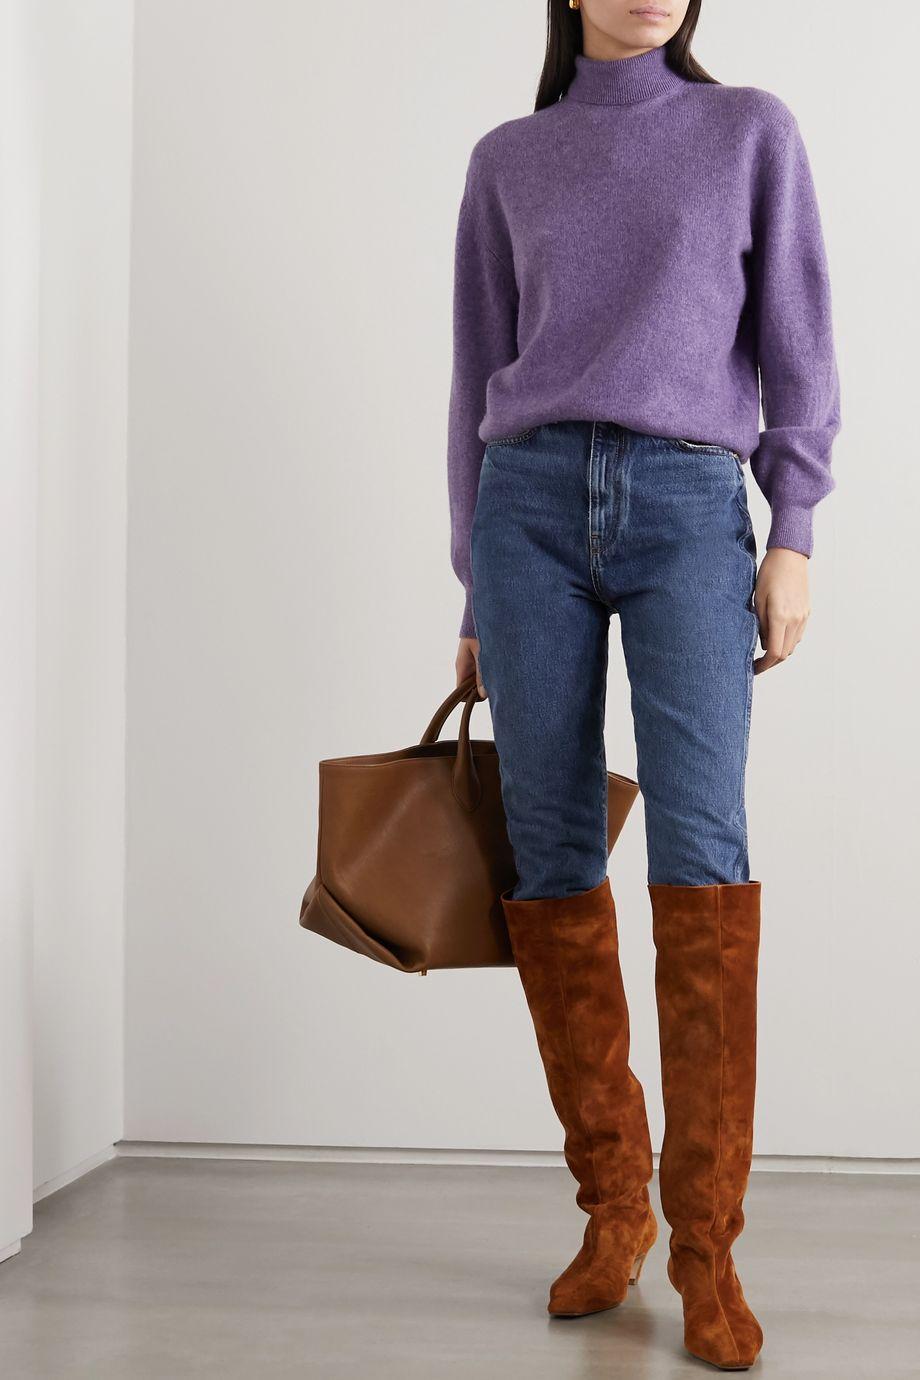 Khaite Julie cashmere-blend turtleneck sweater